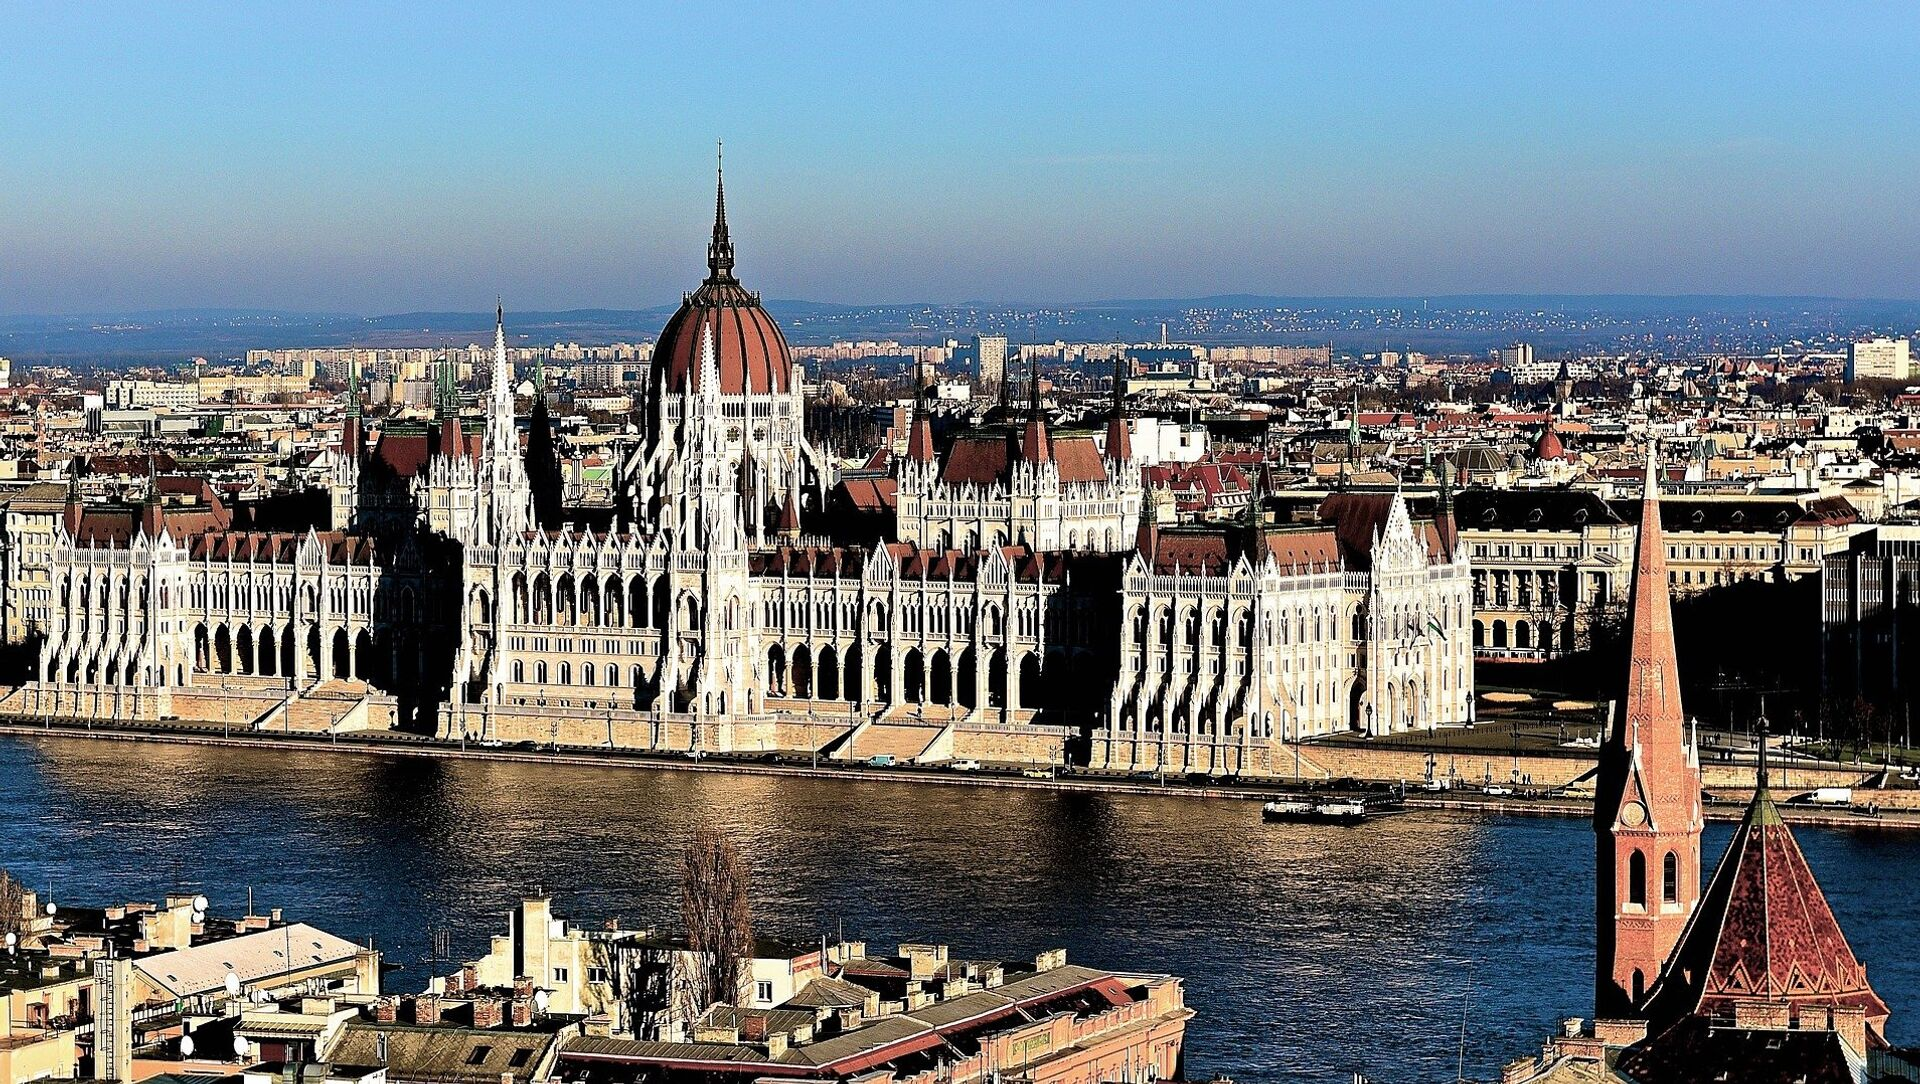 Budapeszt - Sputnik Polska, 1920, 07.02.2021